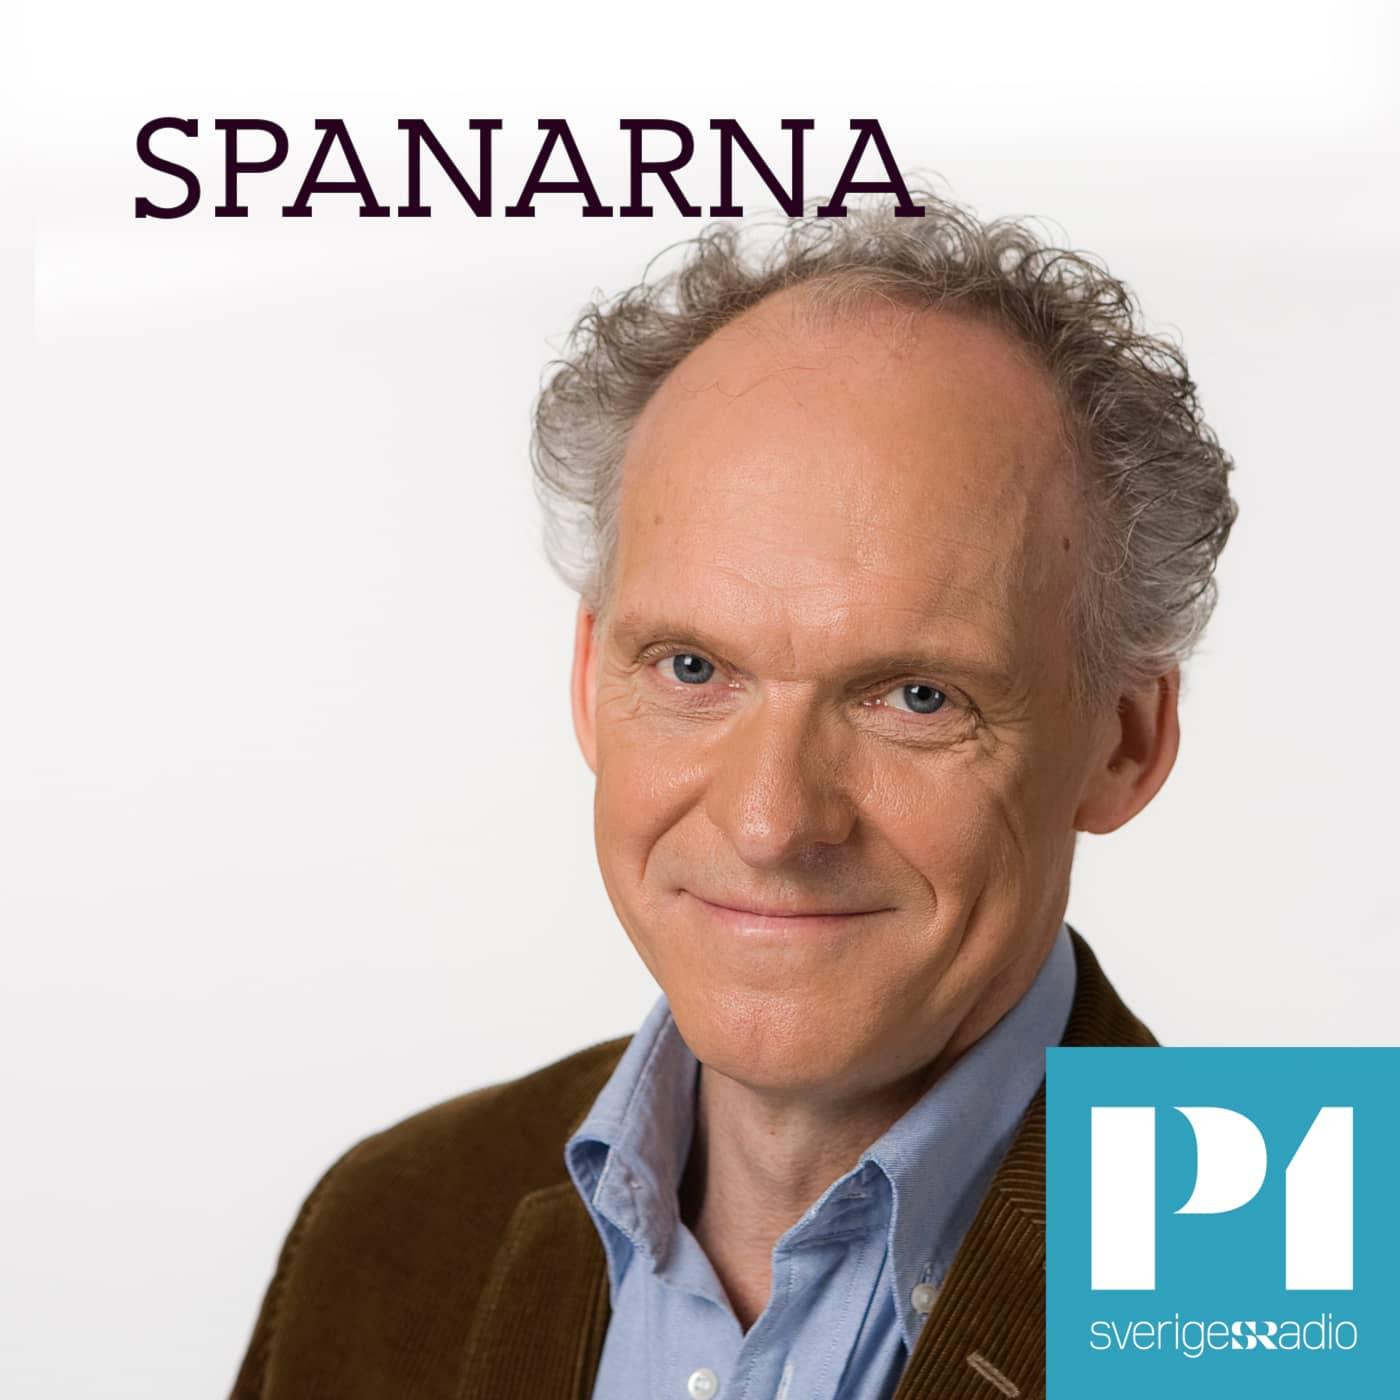 Spanarna